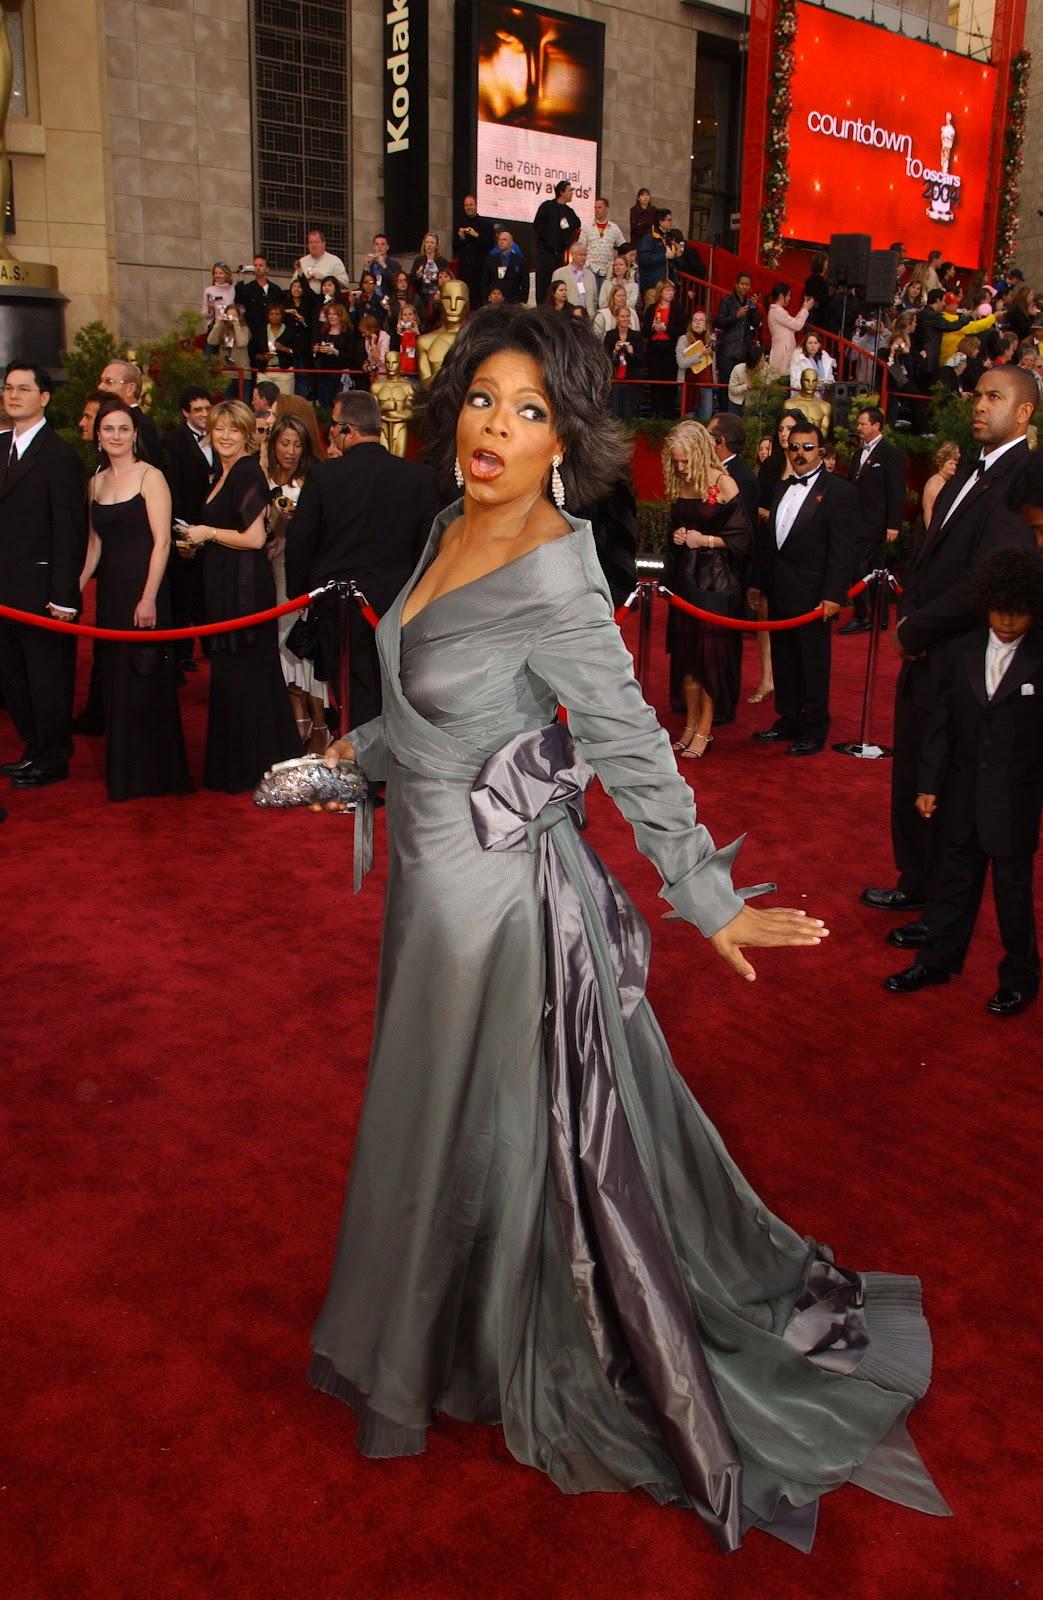 Estate Sales Include Michael Jordan, Oprah Winfrey, Anderson Cooper